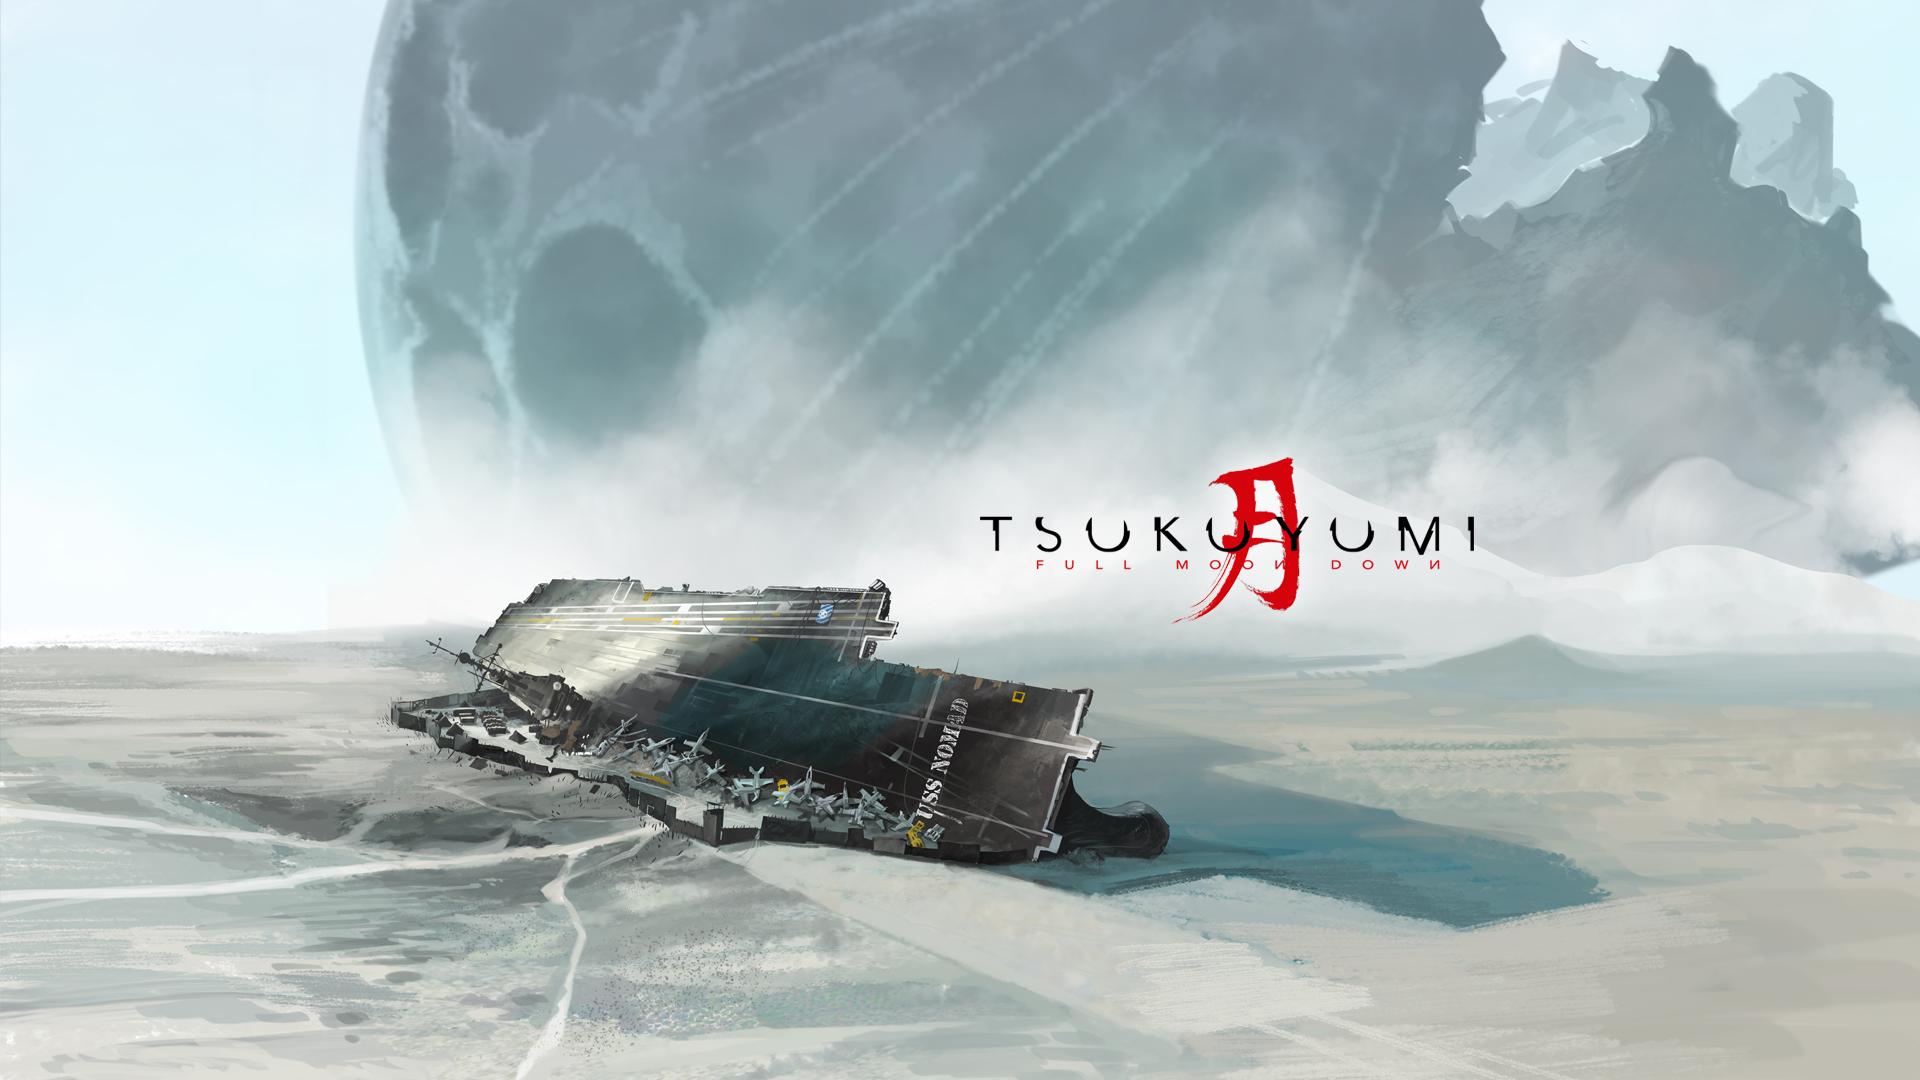 TsukuyumiFullMoonDown_Wallpaper_3.jpg